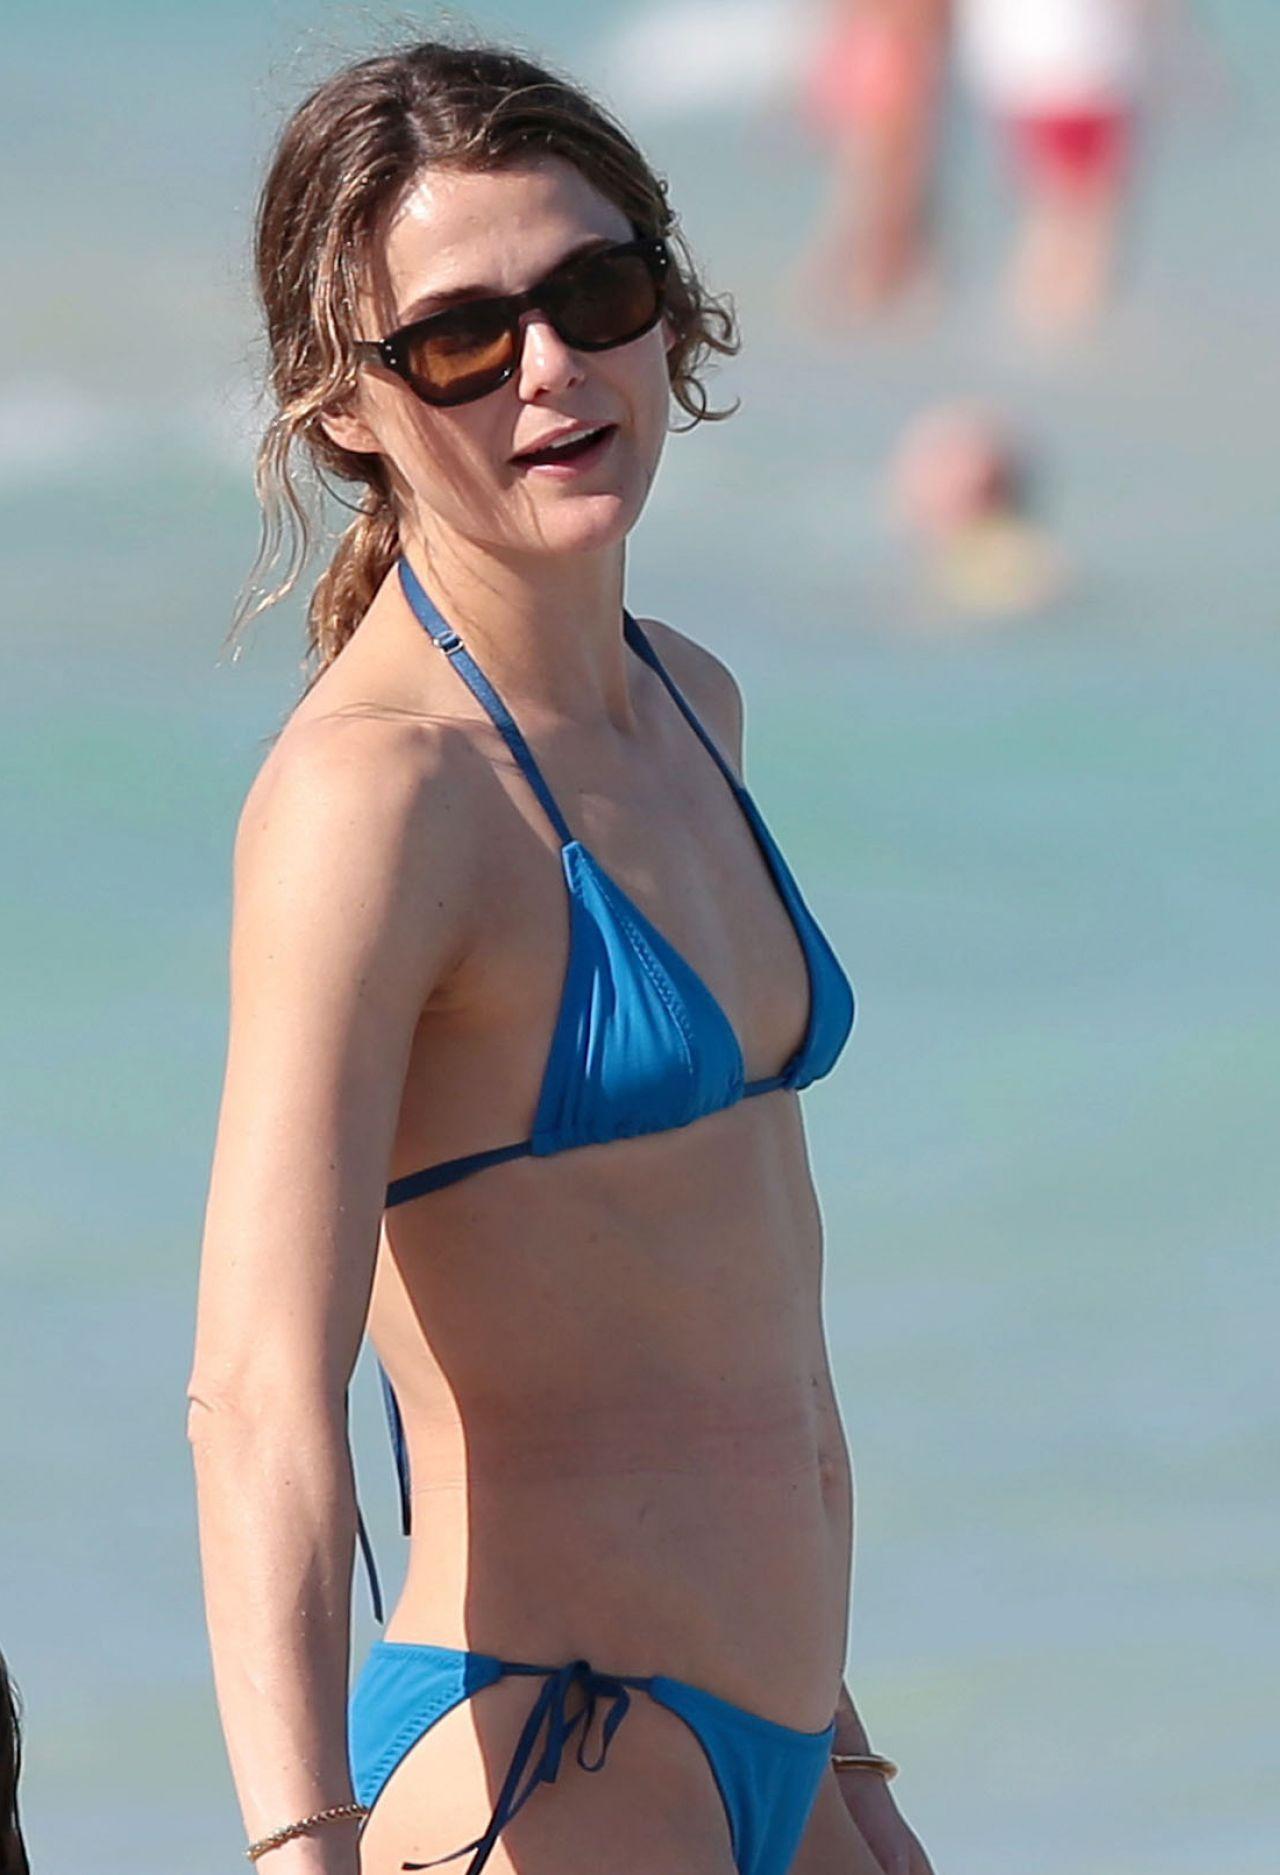 Keri Russell Bikini Candids At A Beach In Miami April 2015